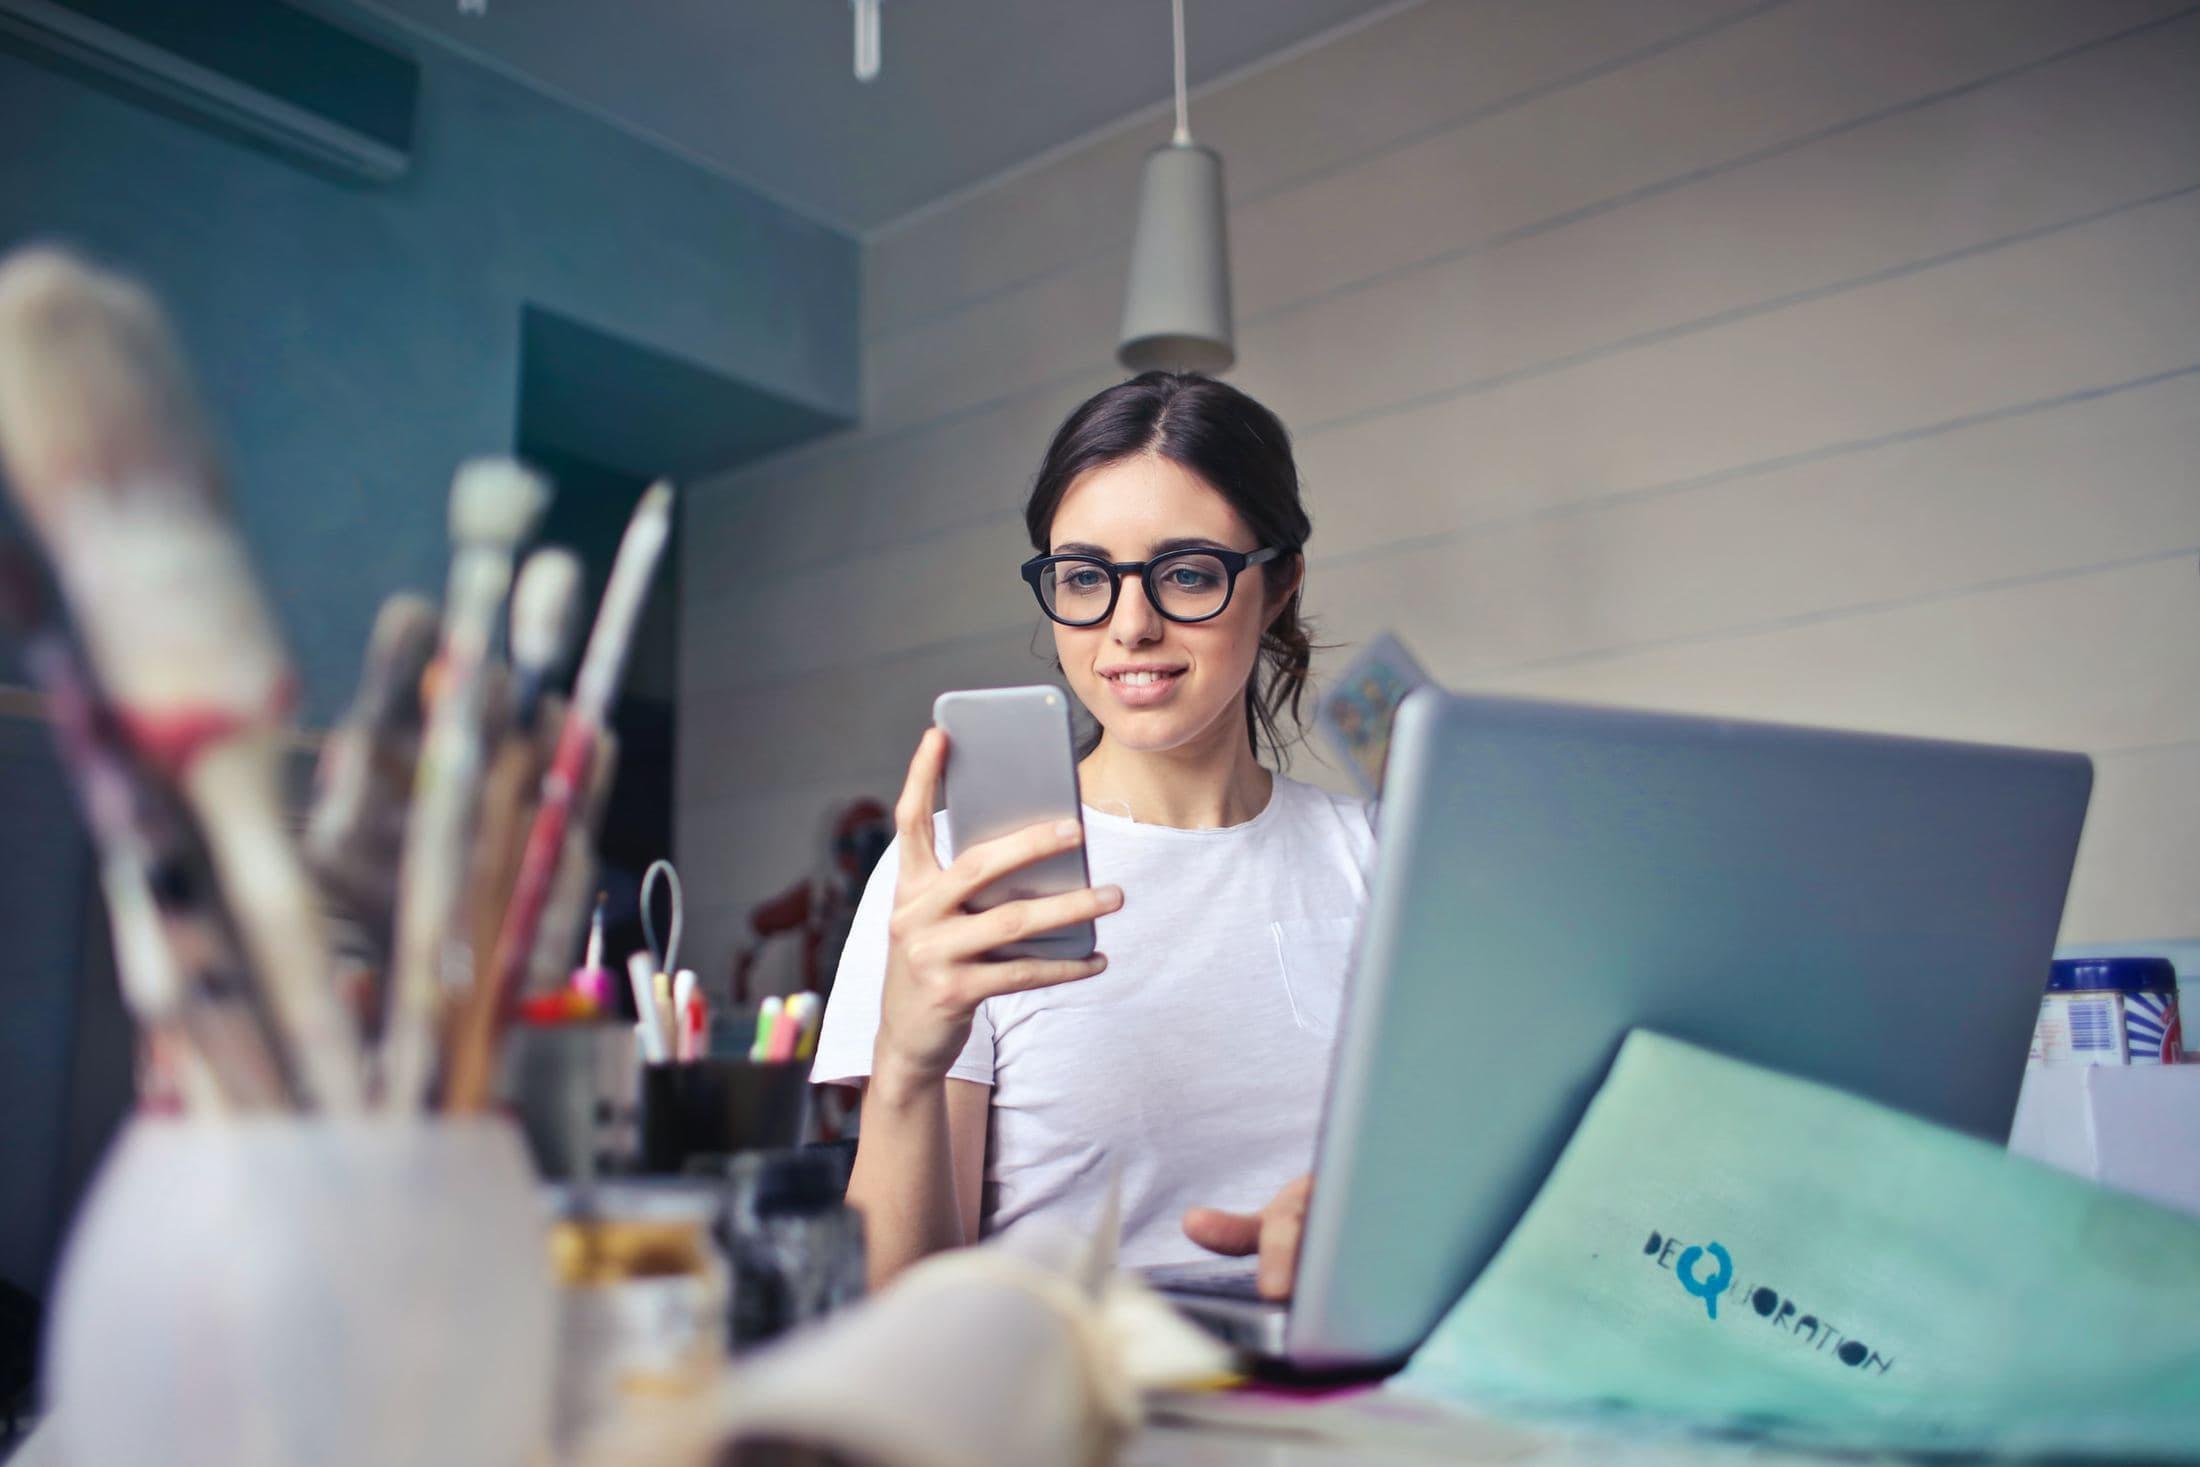 woman in white shirt using smartphone